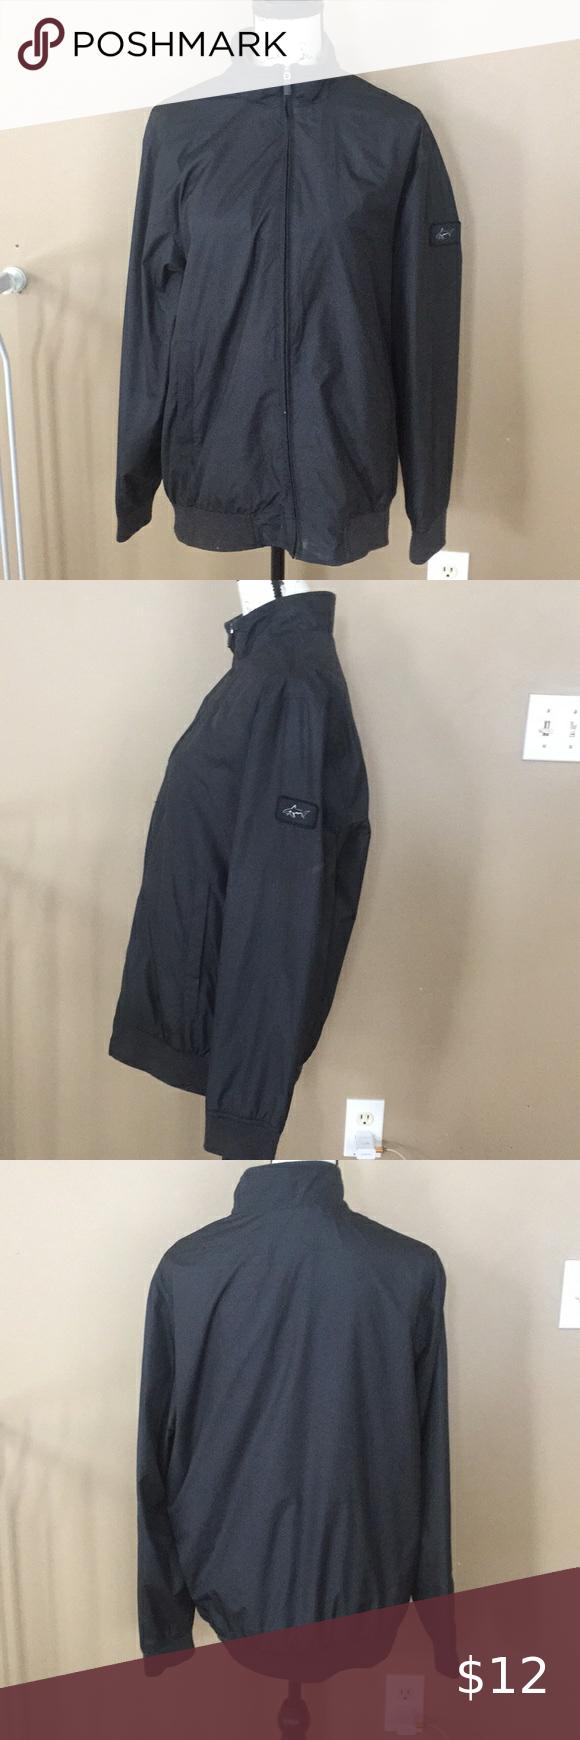 Greg Norman Men S Jacket Size M Black Wind Breaker In 2020 Black Windbreaker Clothes Design Windbreaker